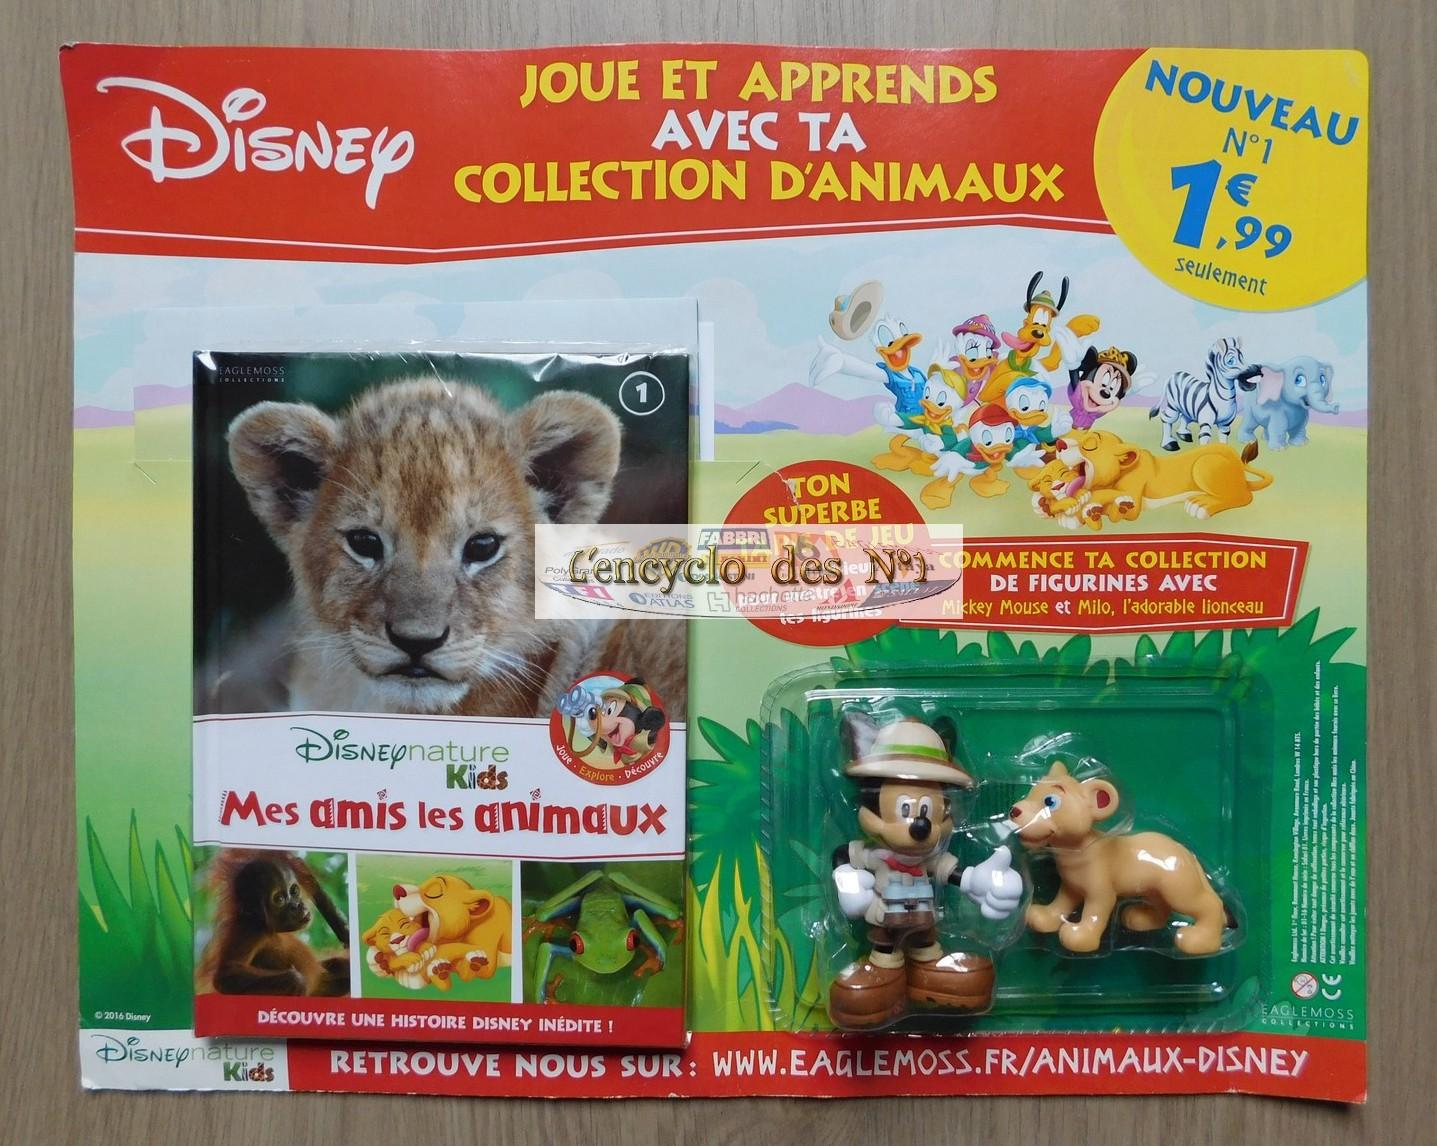 [Collection Press] N° 1 Disney mes amis les animaux - Eglemoss - Lancement Juillet 2016 T9rVVgw5BMqak2BO5fBh8YFu2lg